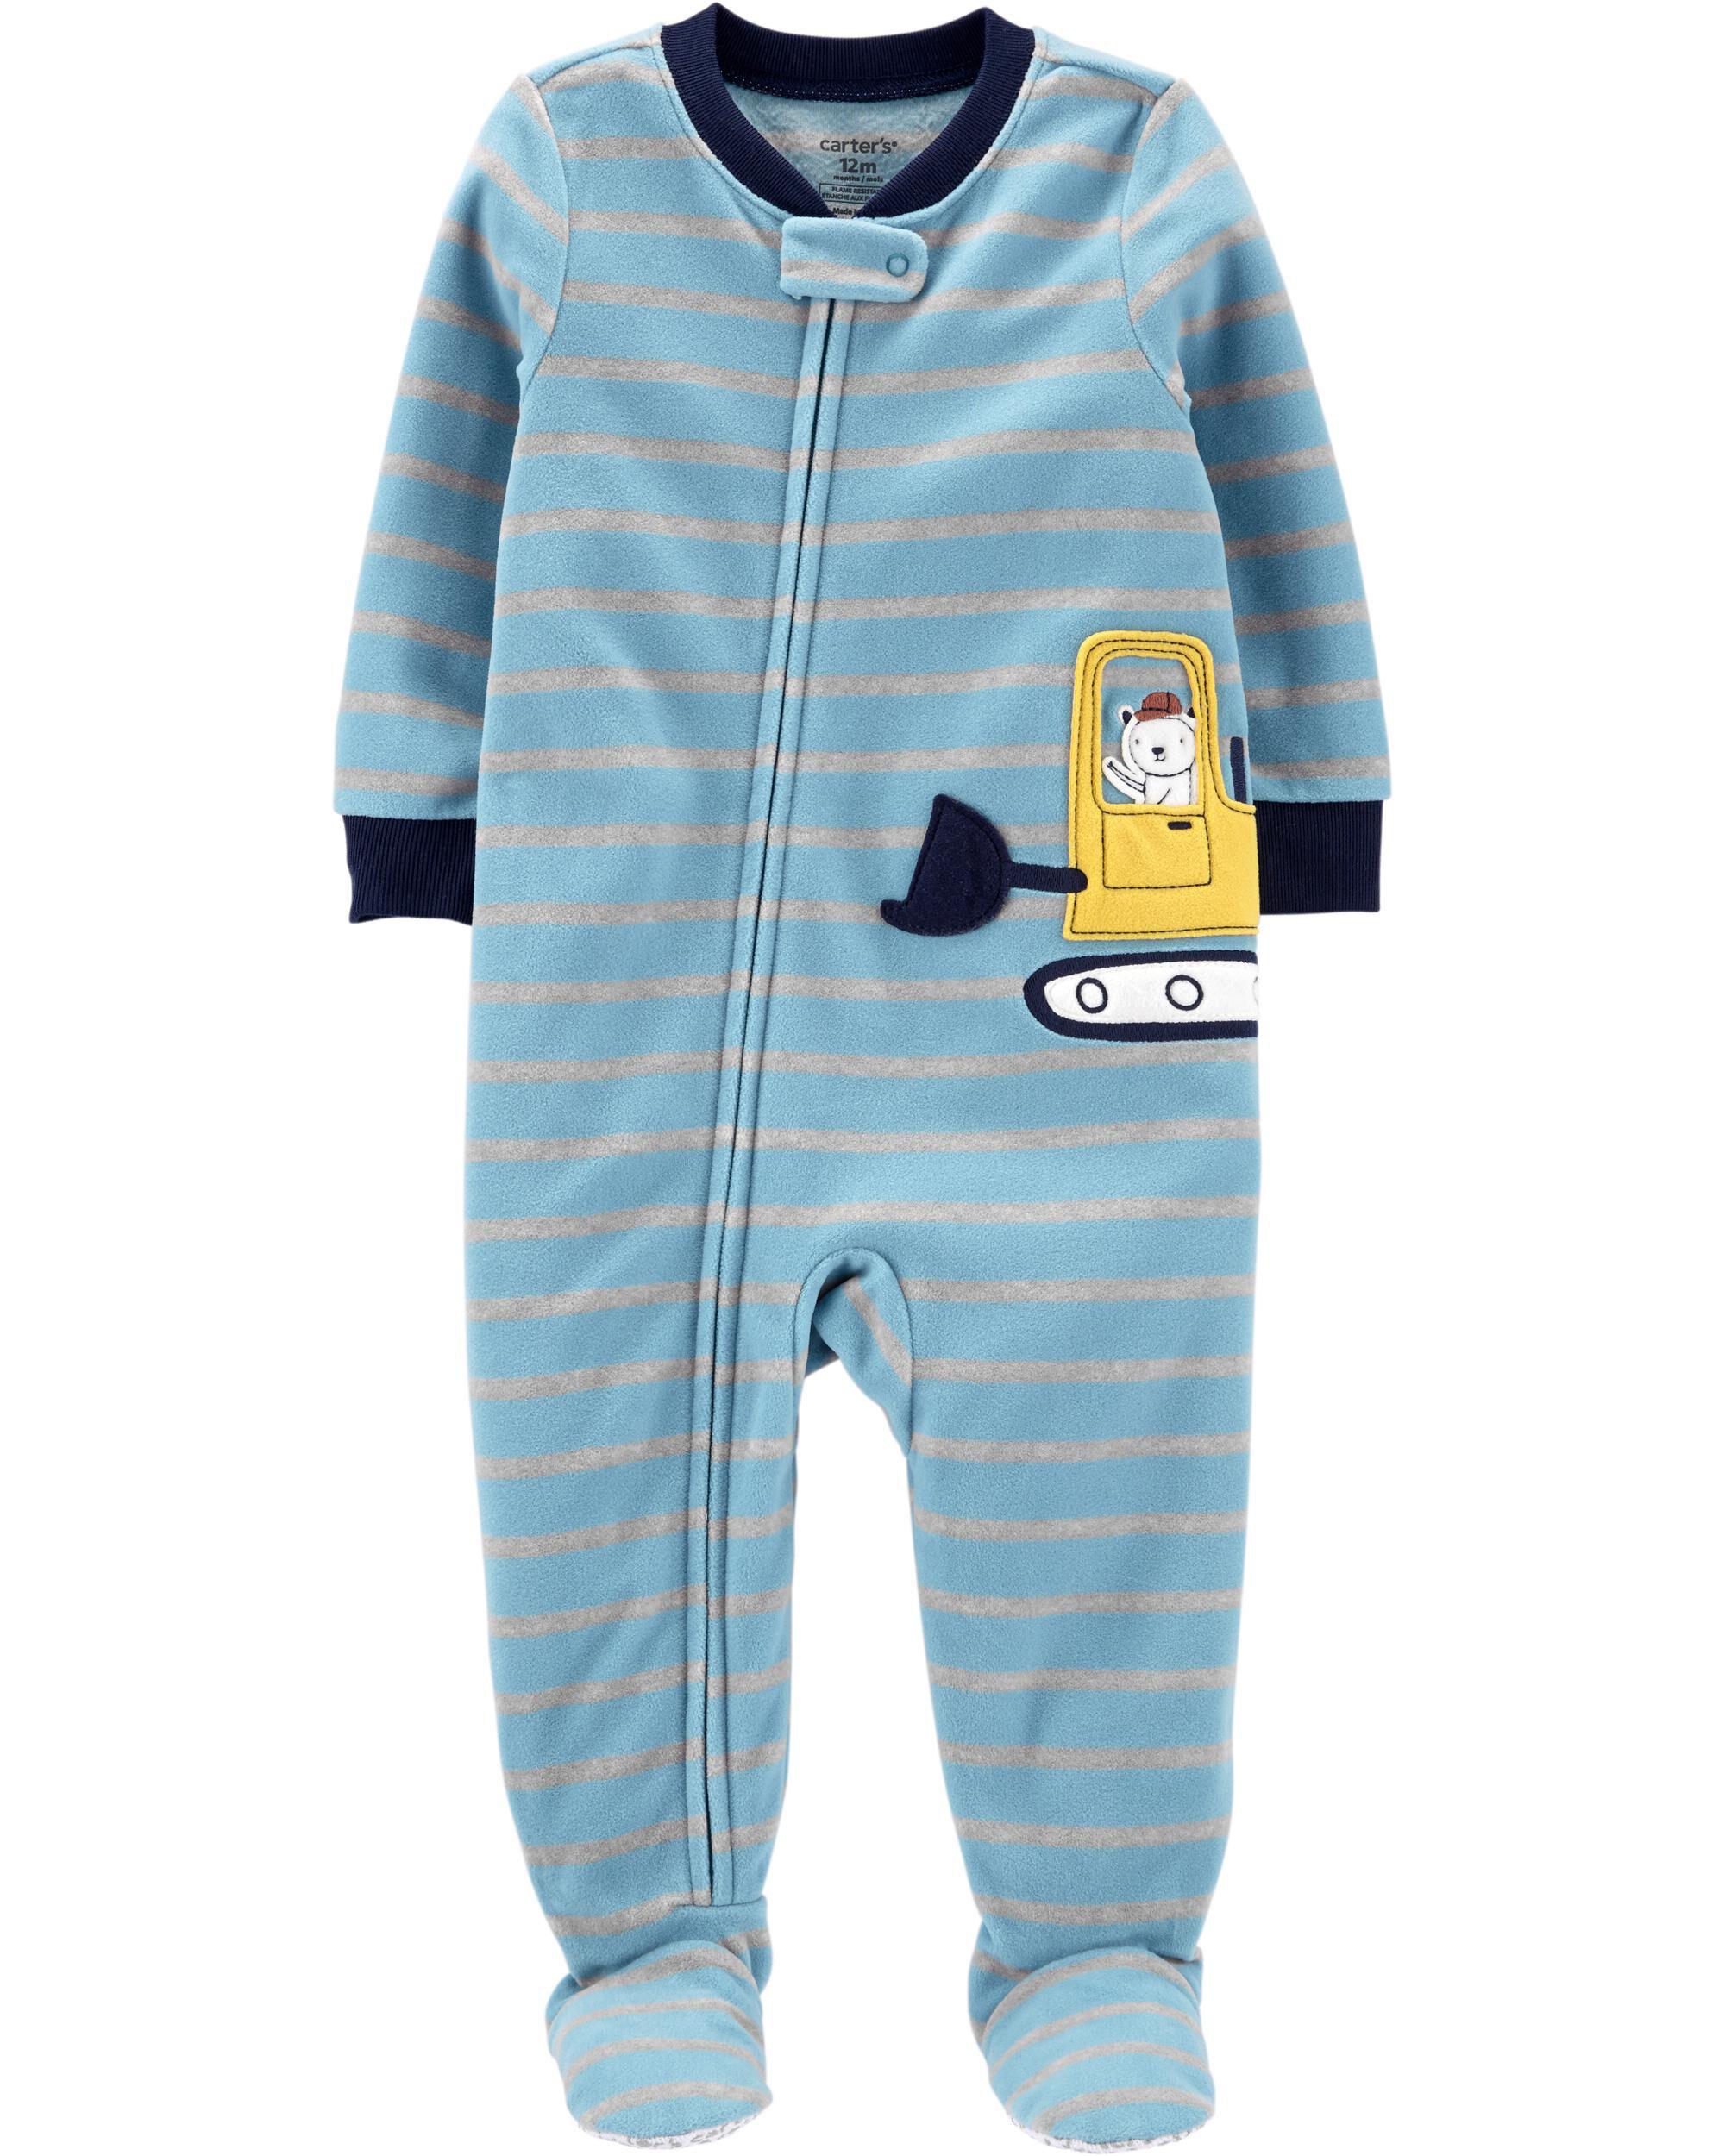 *CLEARANCE* 1-Piece Construction Fleece Footie PJs